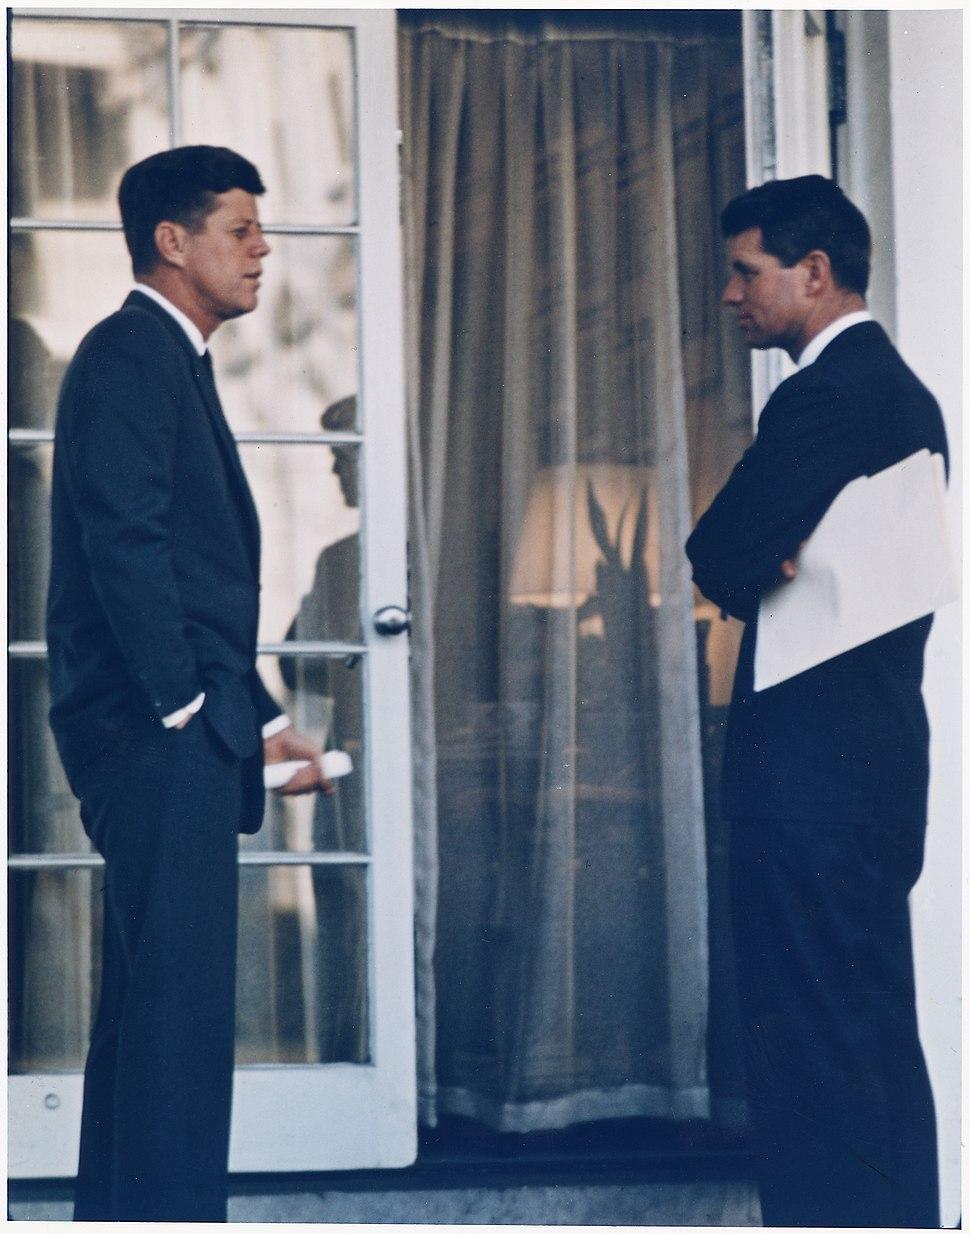 President with Attorney General. President Kennedy, Attorney General Kennedy. White House, Oval Office Doorway. - NARA - 194221